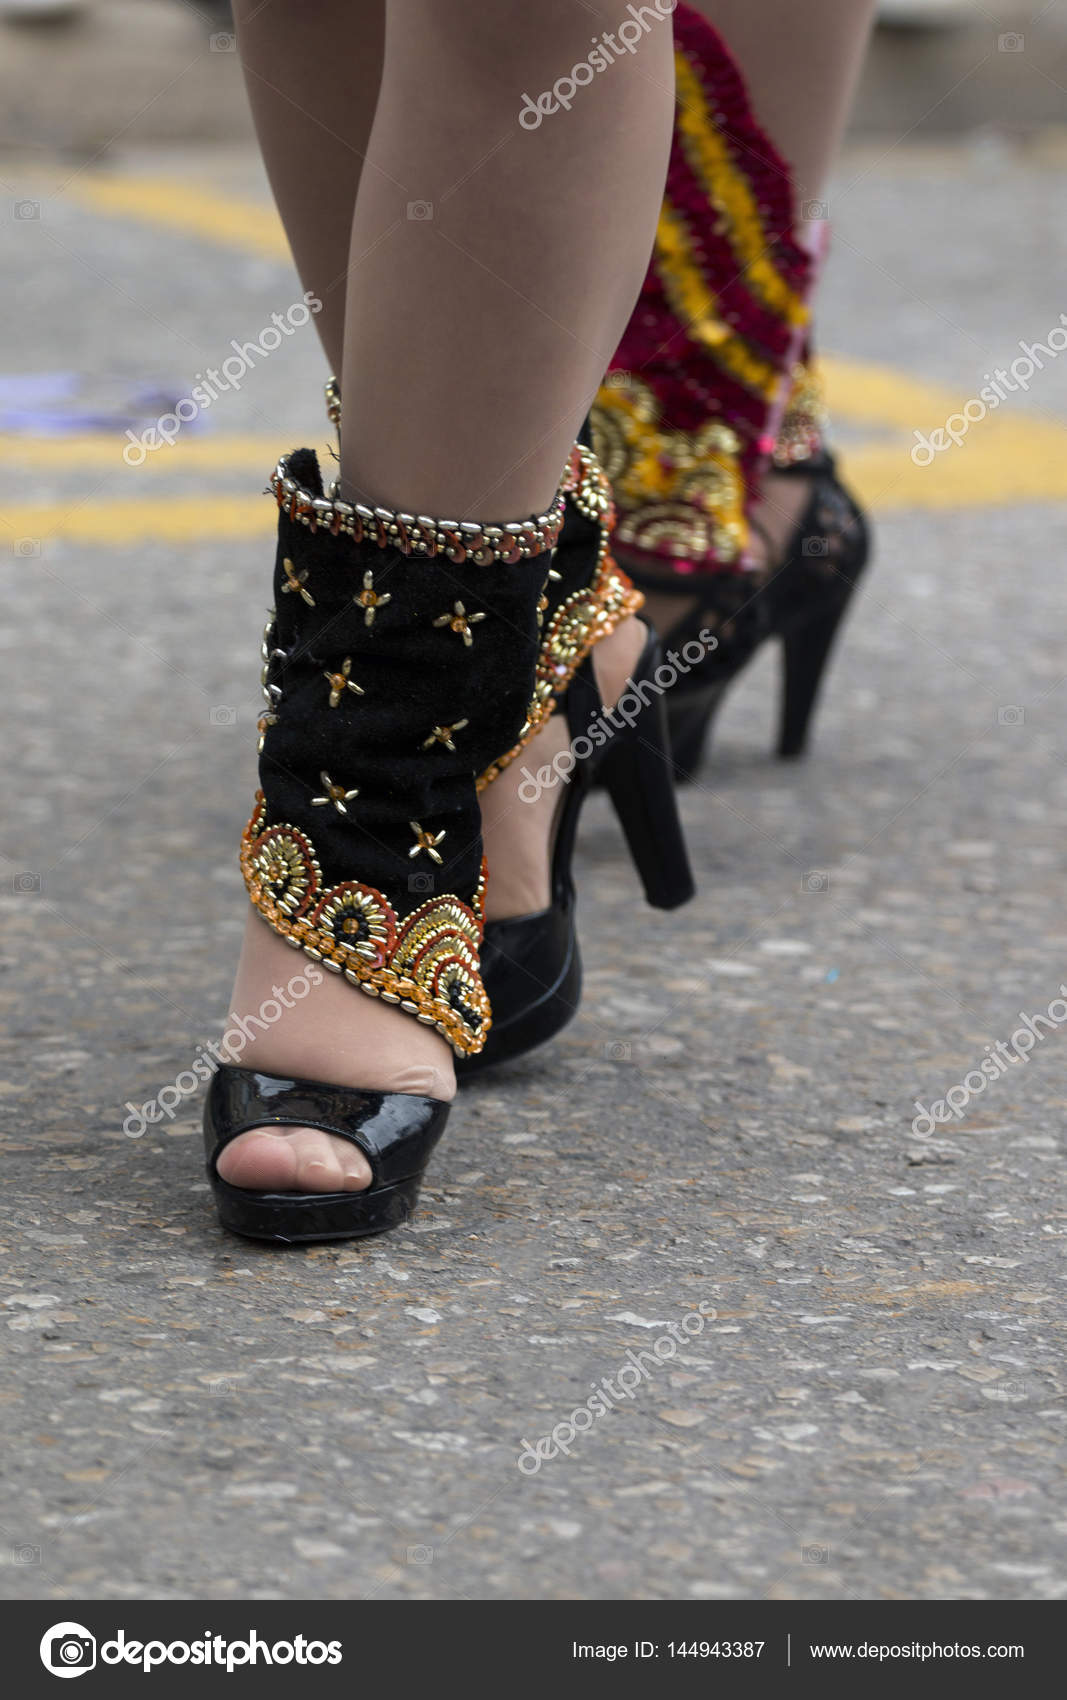 Membio Zapatos Foto Carnaval Stock Mujer — © De 144943387 w4TnvPZx4 a0d9955a5a53